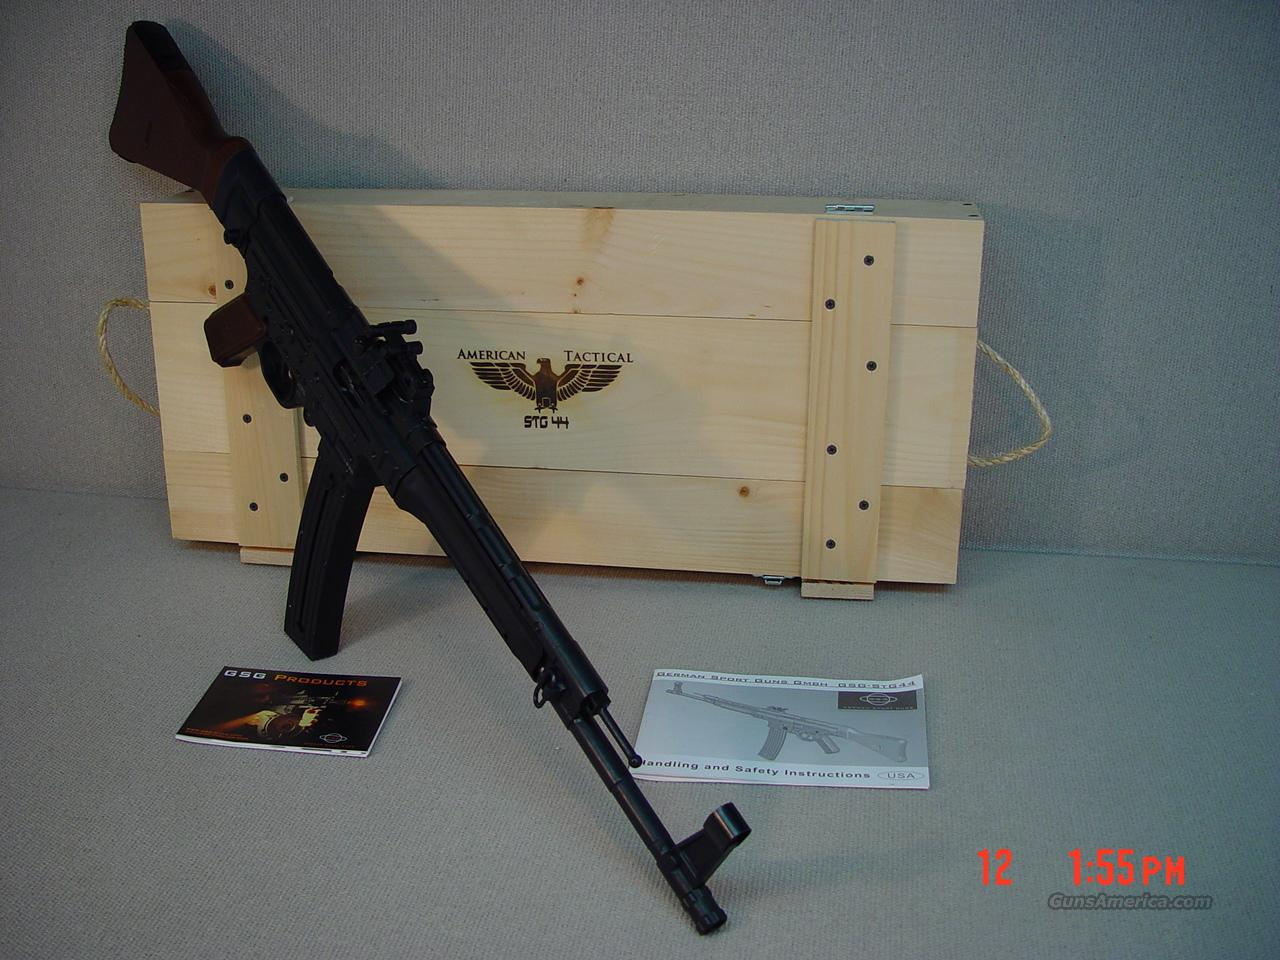 ATI GSG STG 44 22 LR / 5.6x15mmR   Guns > Rifles > American Tactical Imports Rifles